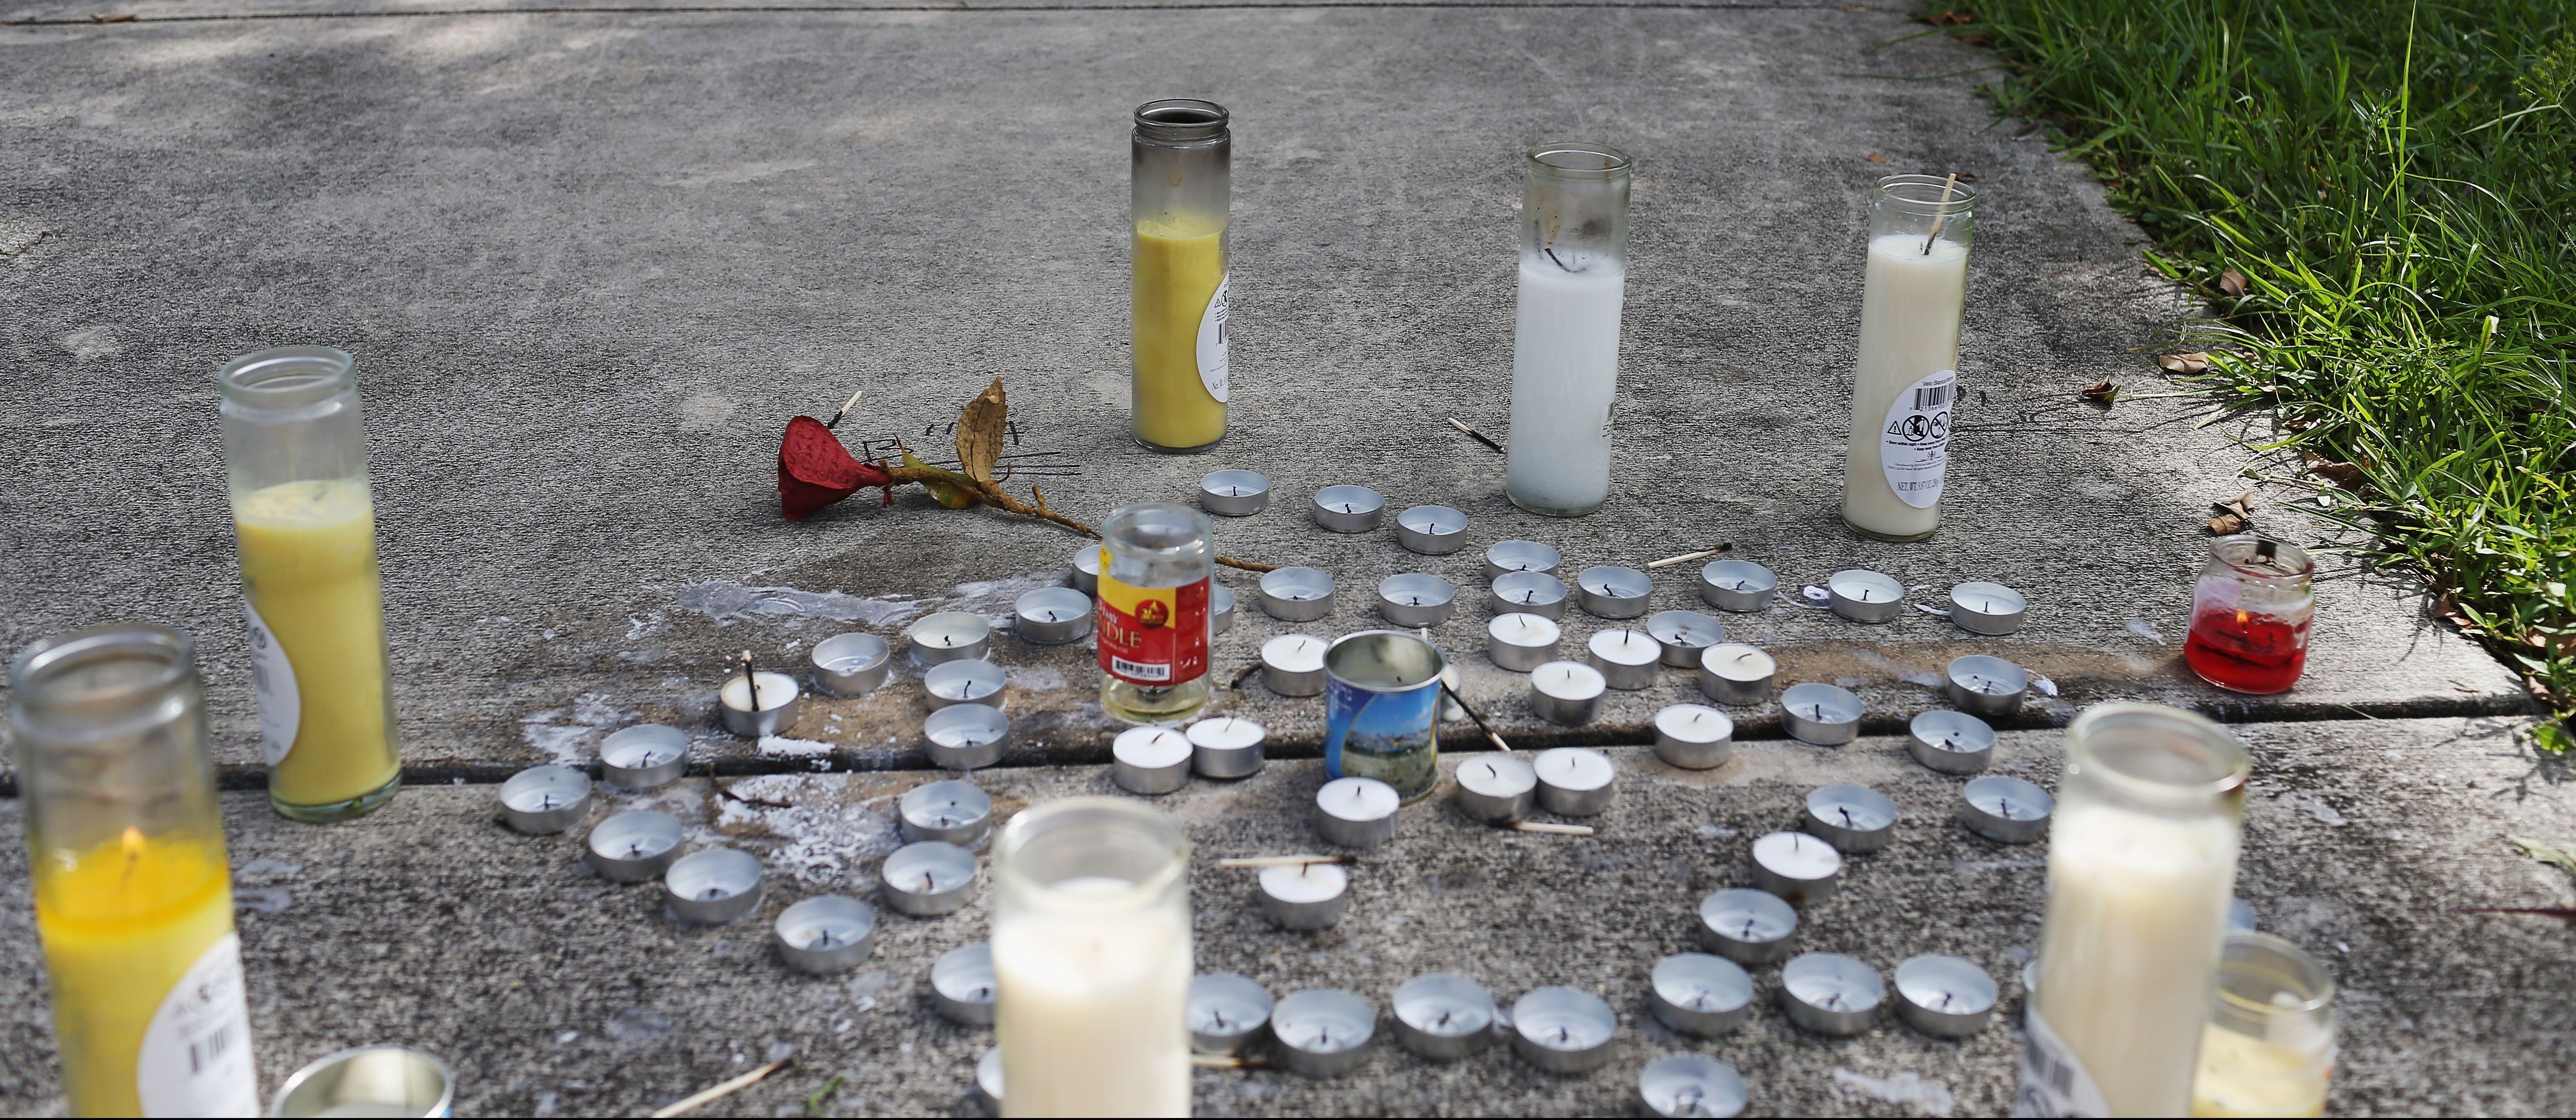 Memorial for Brooklyn Rabbi Joseph Raksin in North Miami Beach.